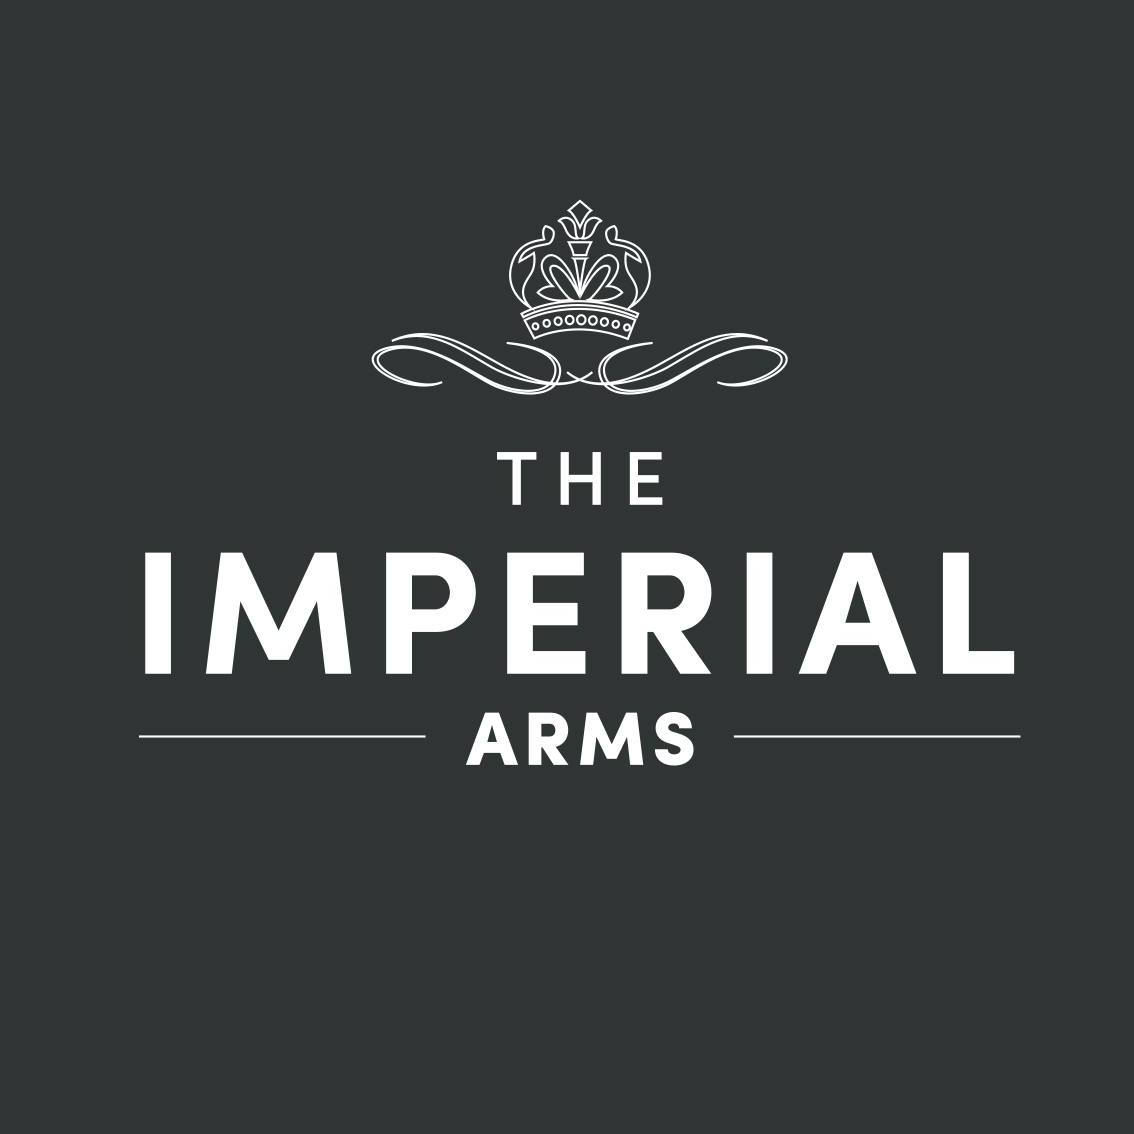 Imperial arms logo1.jpg